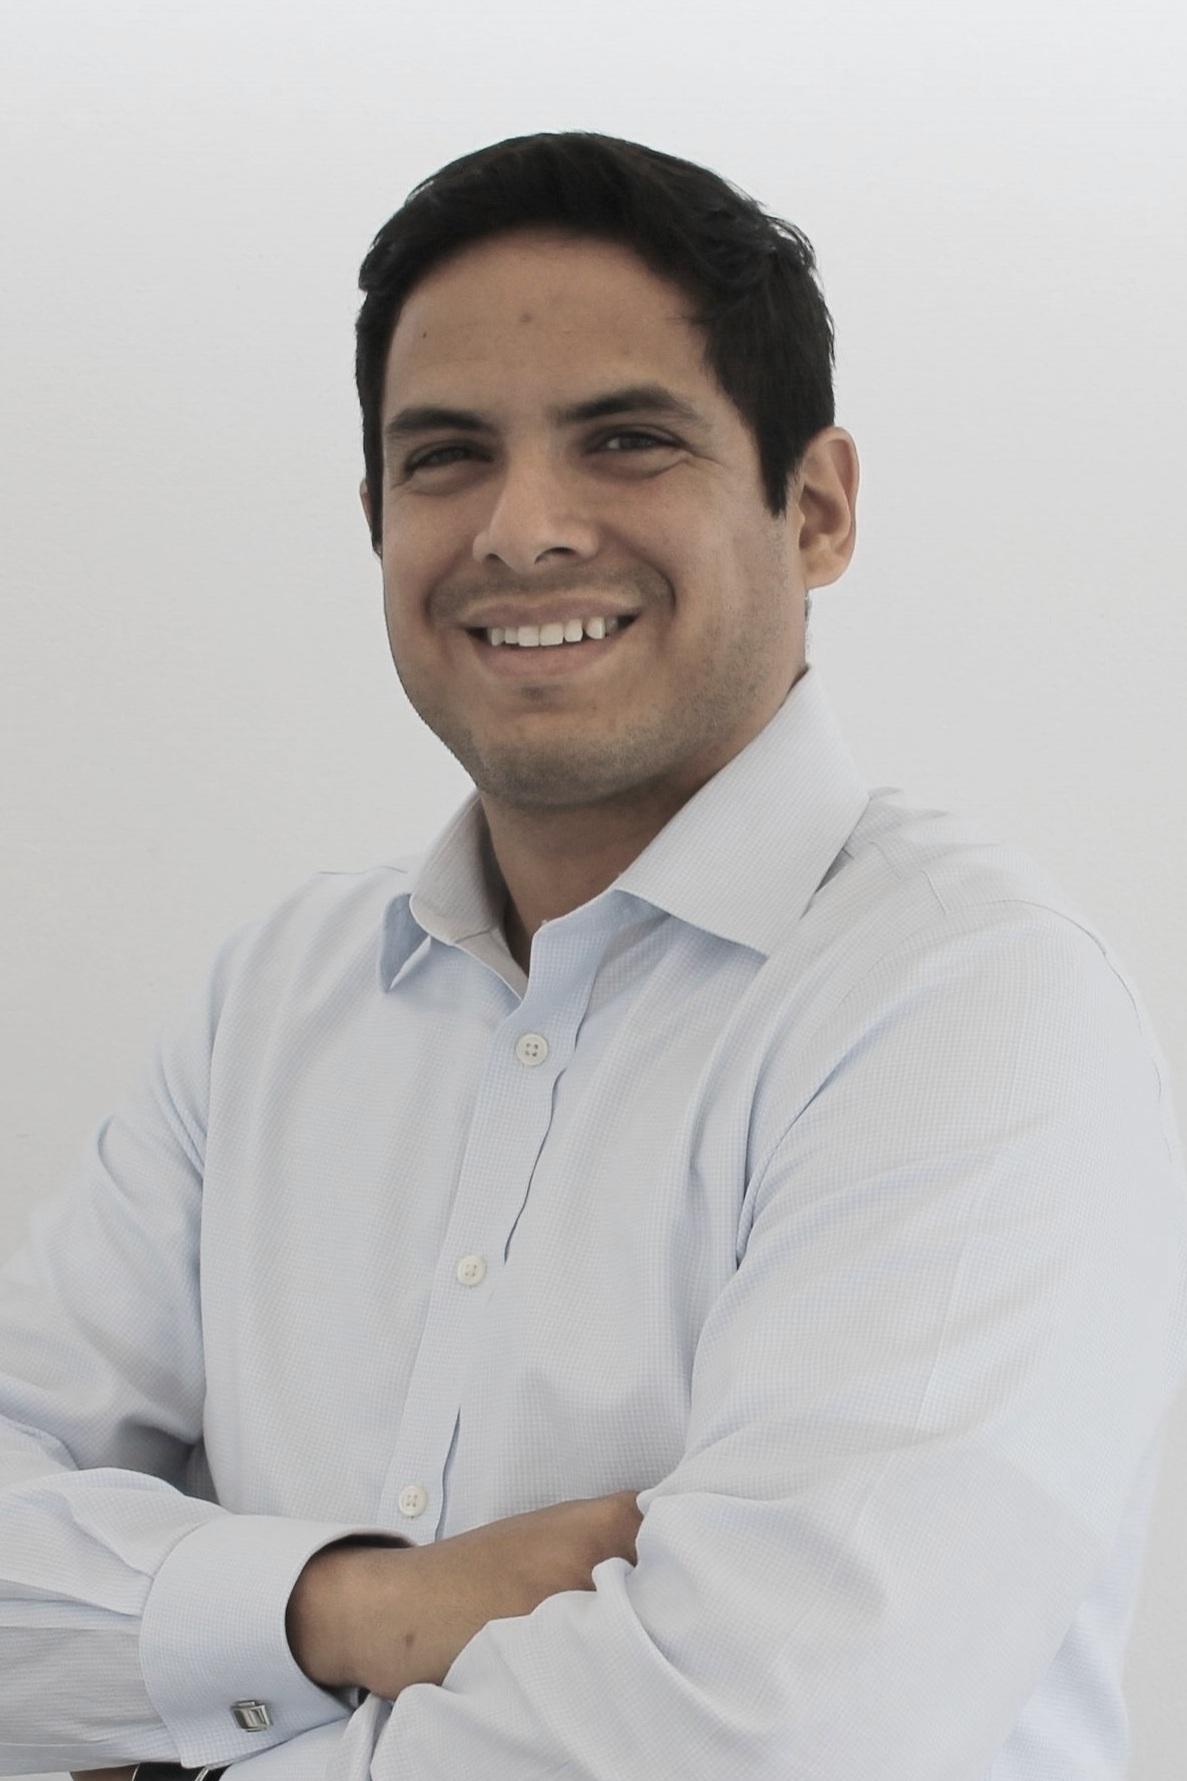 Luis Arbulú